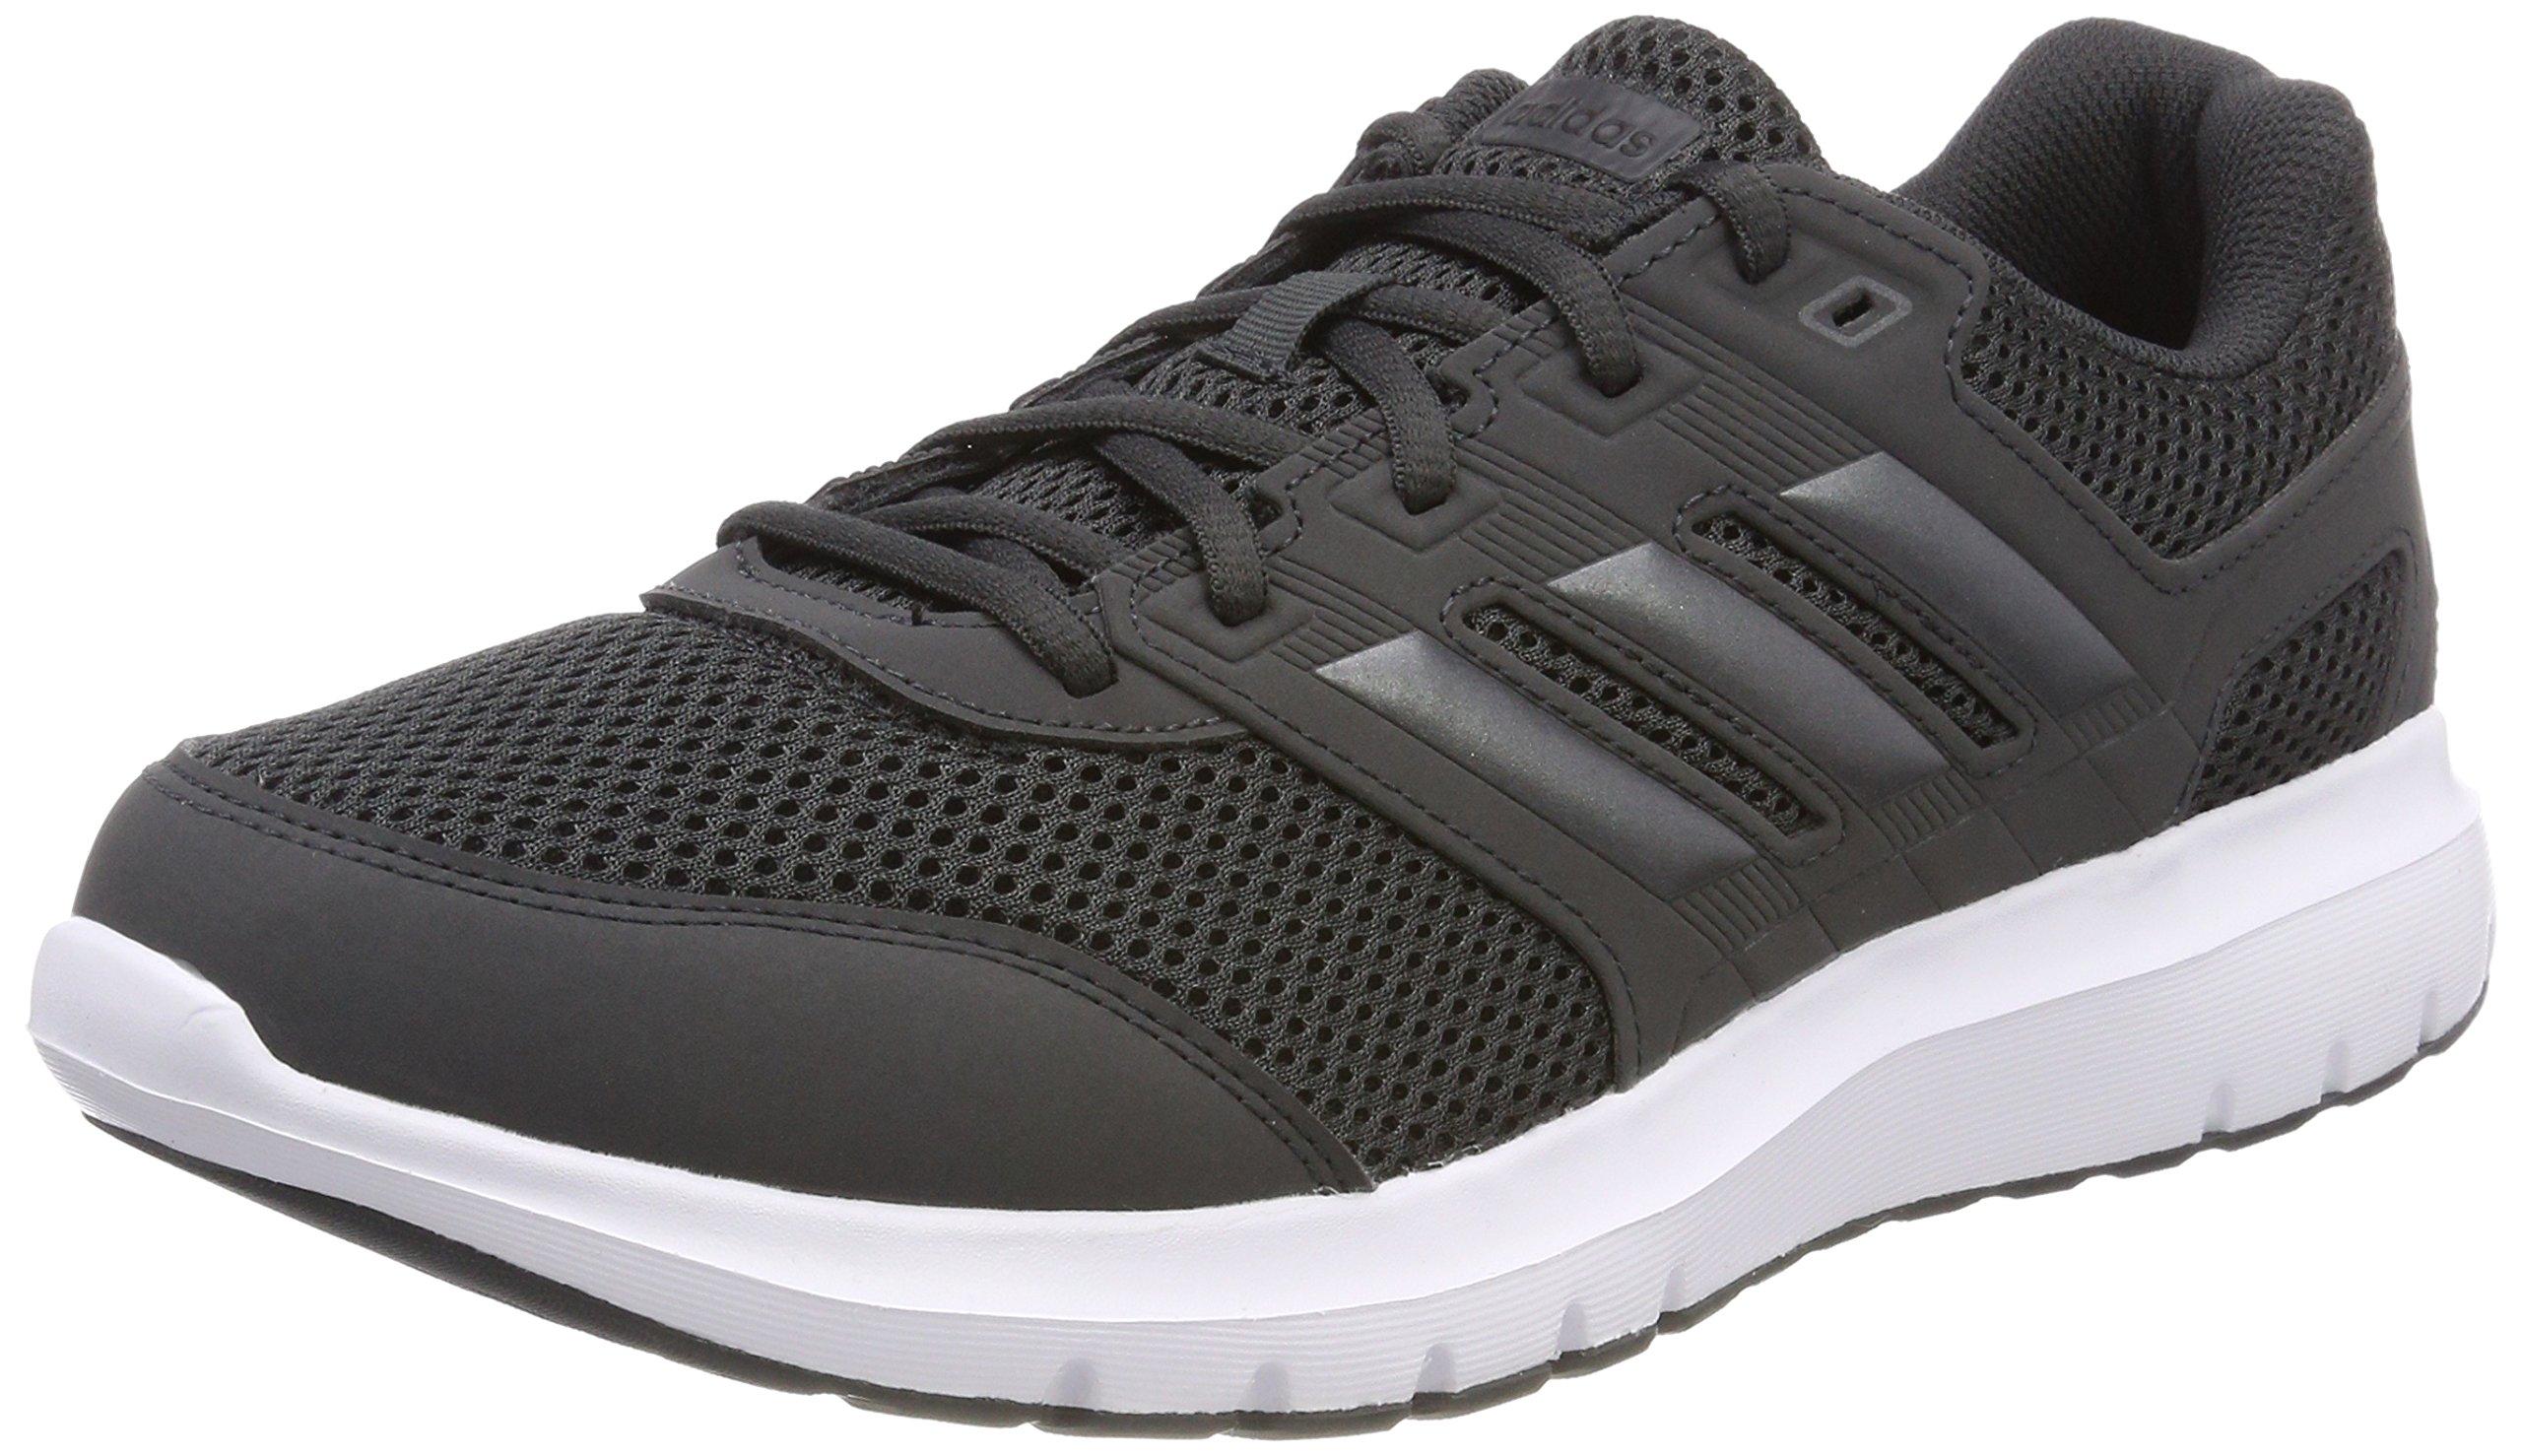 adidas 阿迪达斯 男 跑步鞋 DURAMO LITE 2.0 CG4044